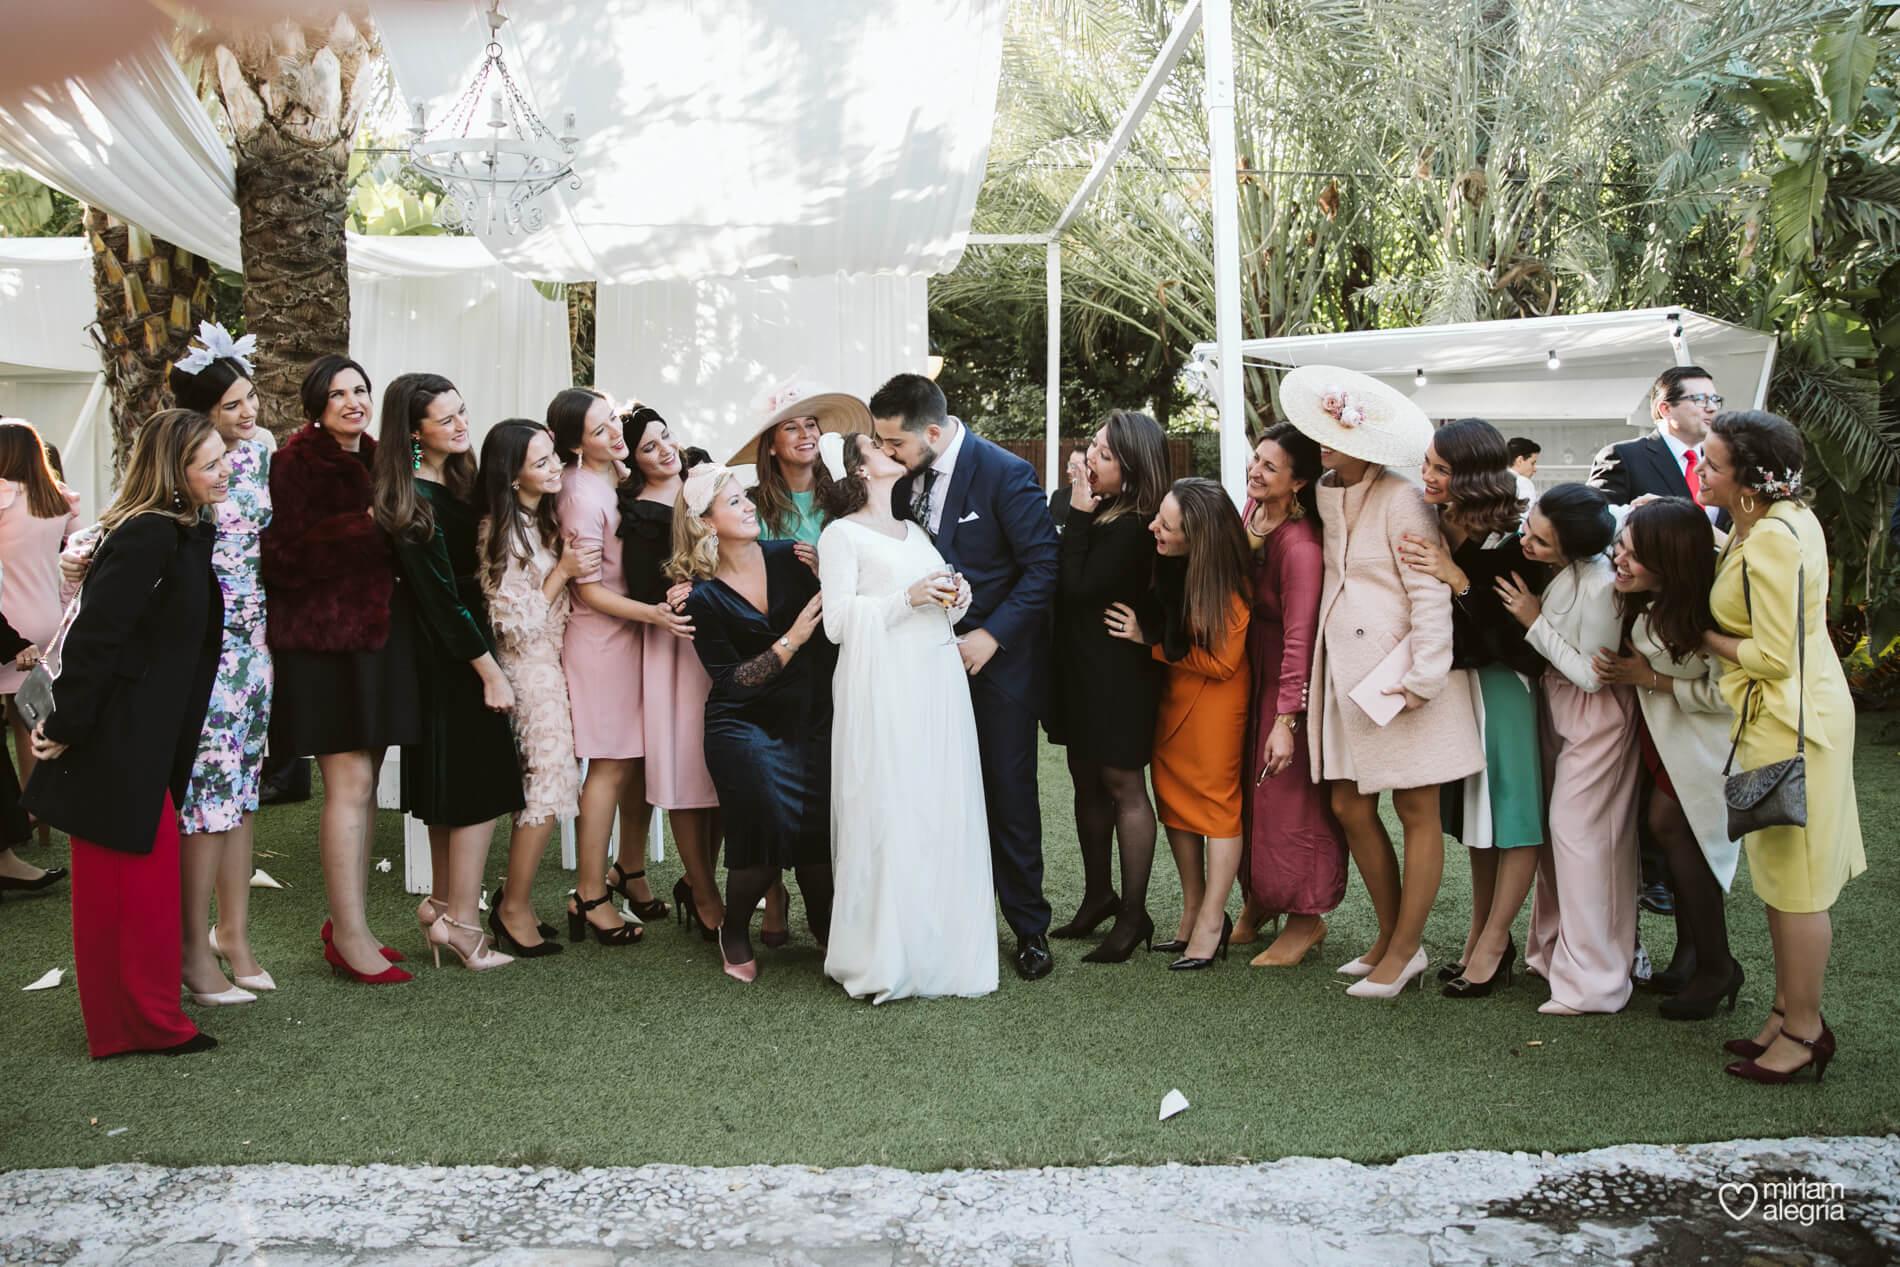 leoymarcos-una-novia-velada-153